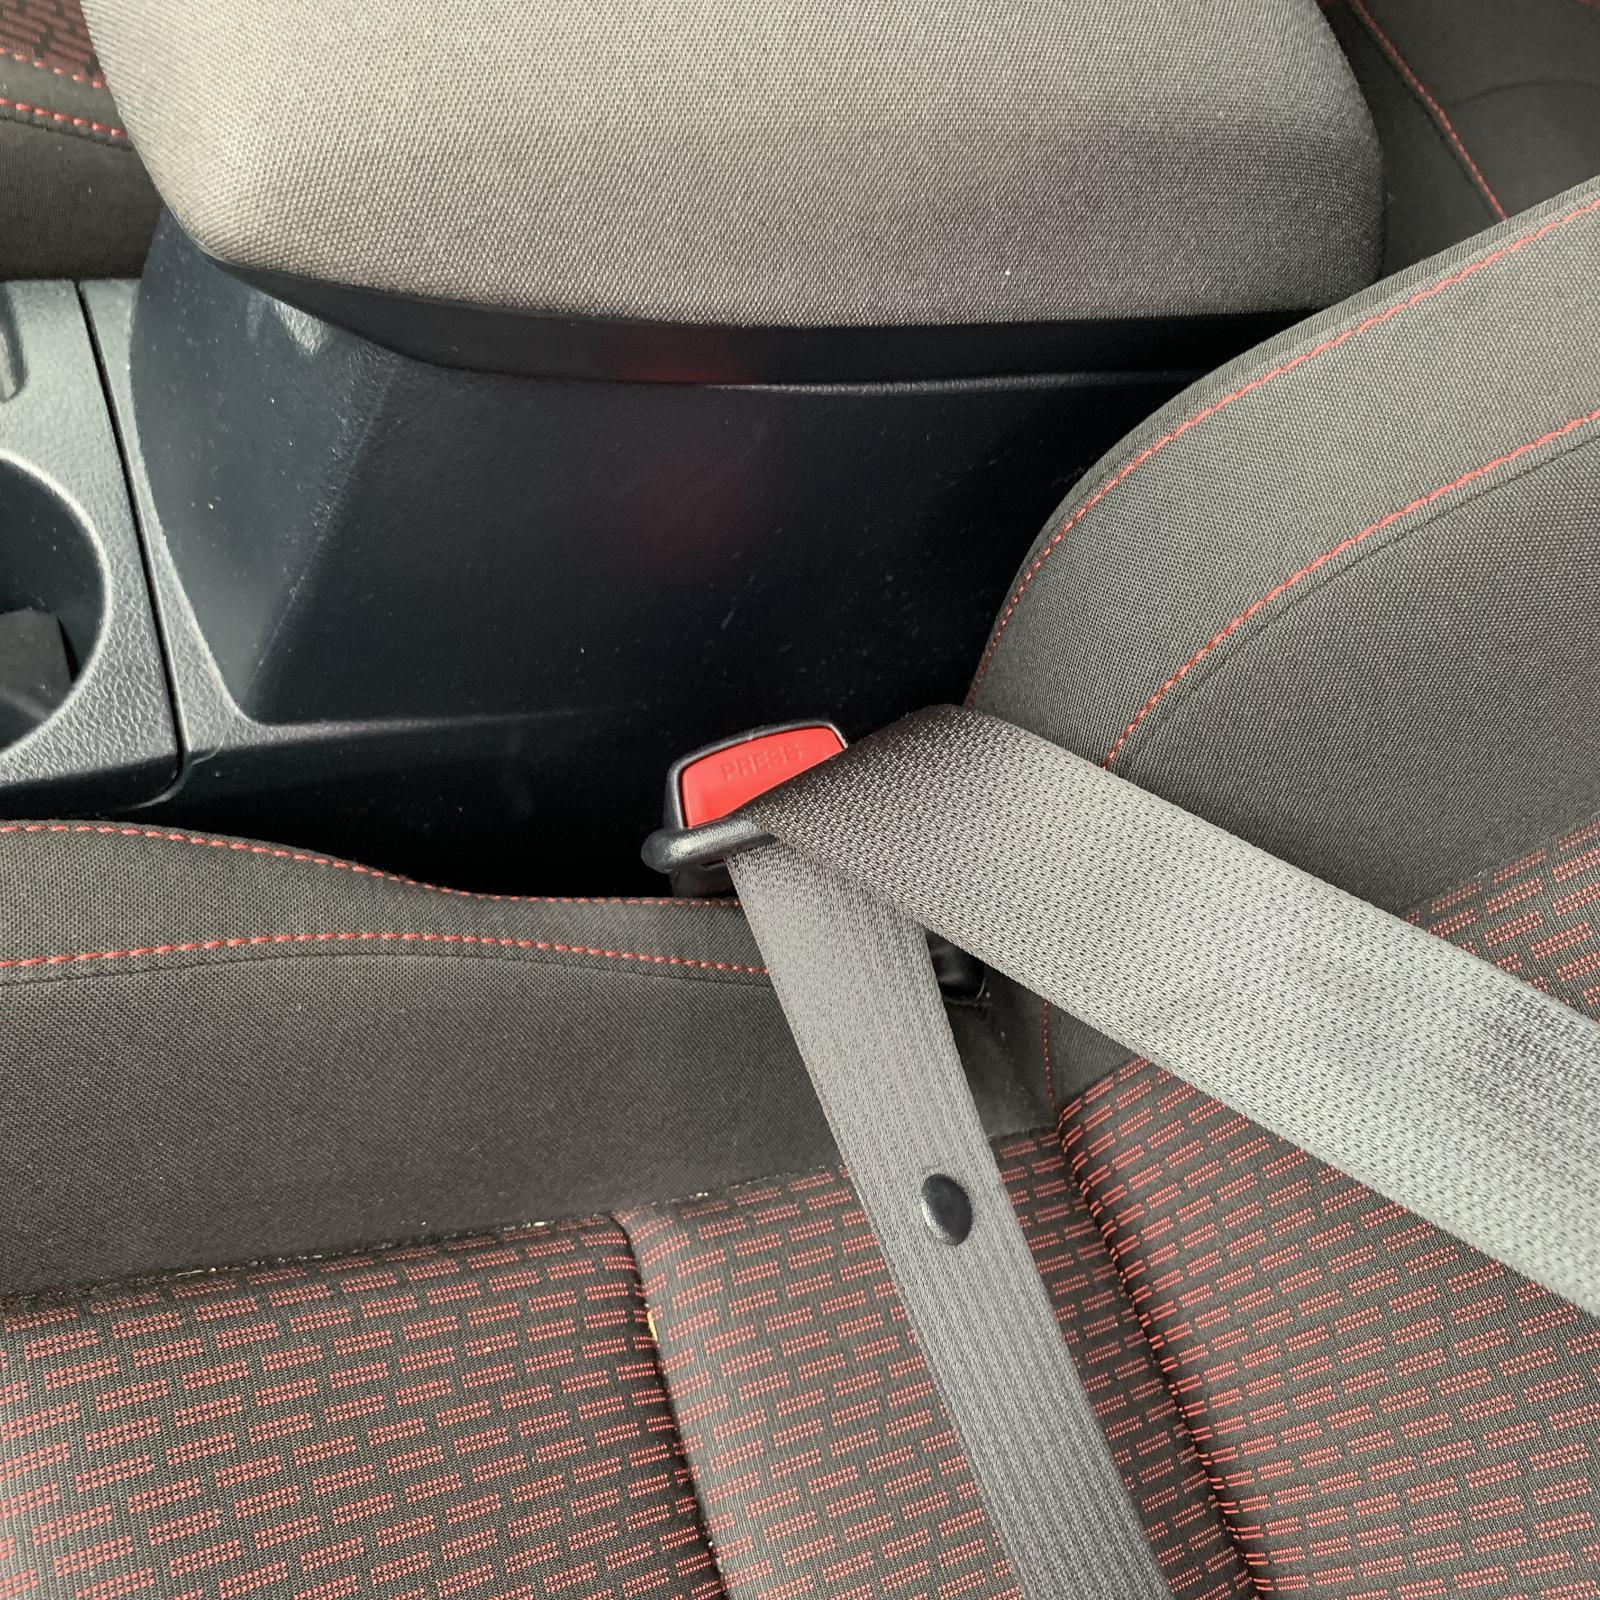 TOYOTA COROLLA, Seatbelt/Stalk, LH FRONT, SEAT BELT ONLY, ZRE182R, HATCH, 10/12-